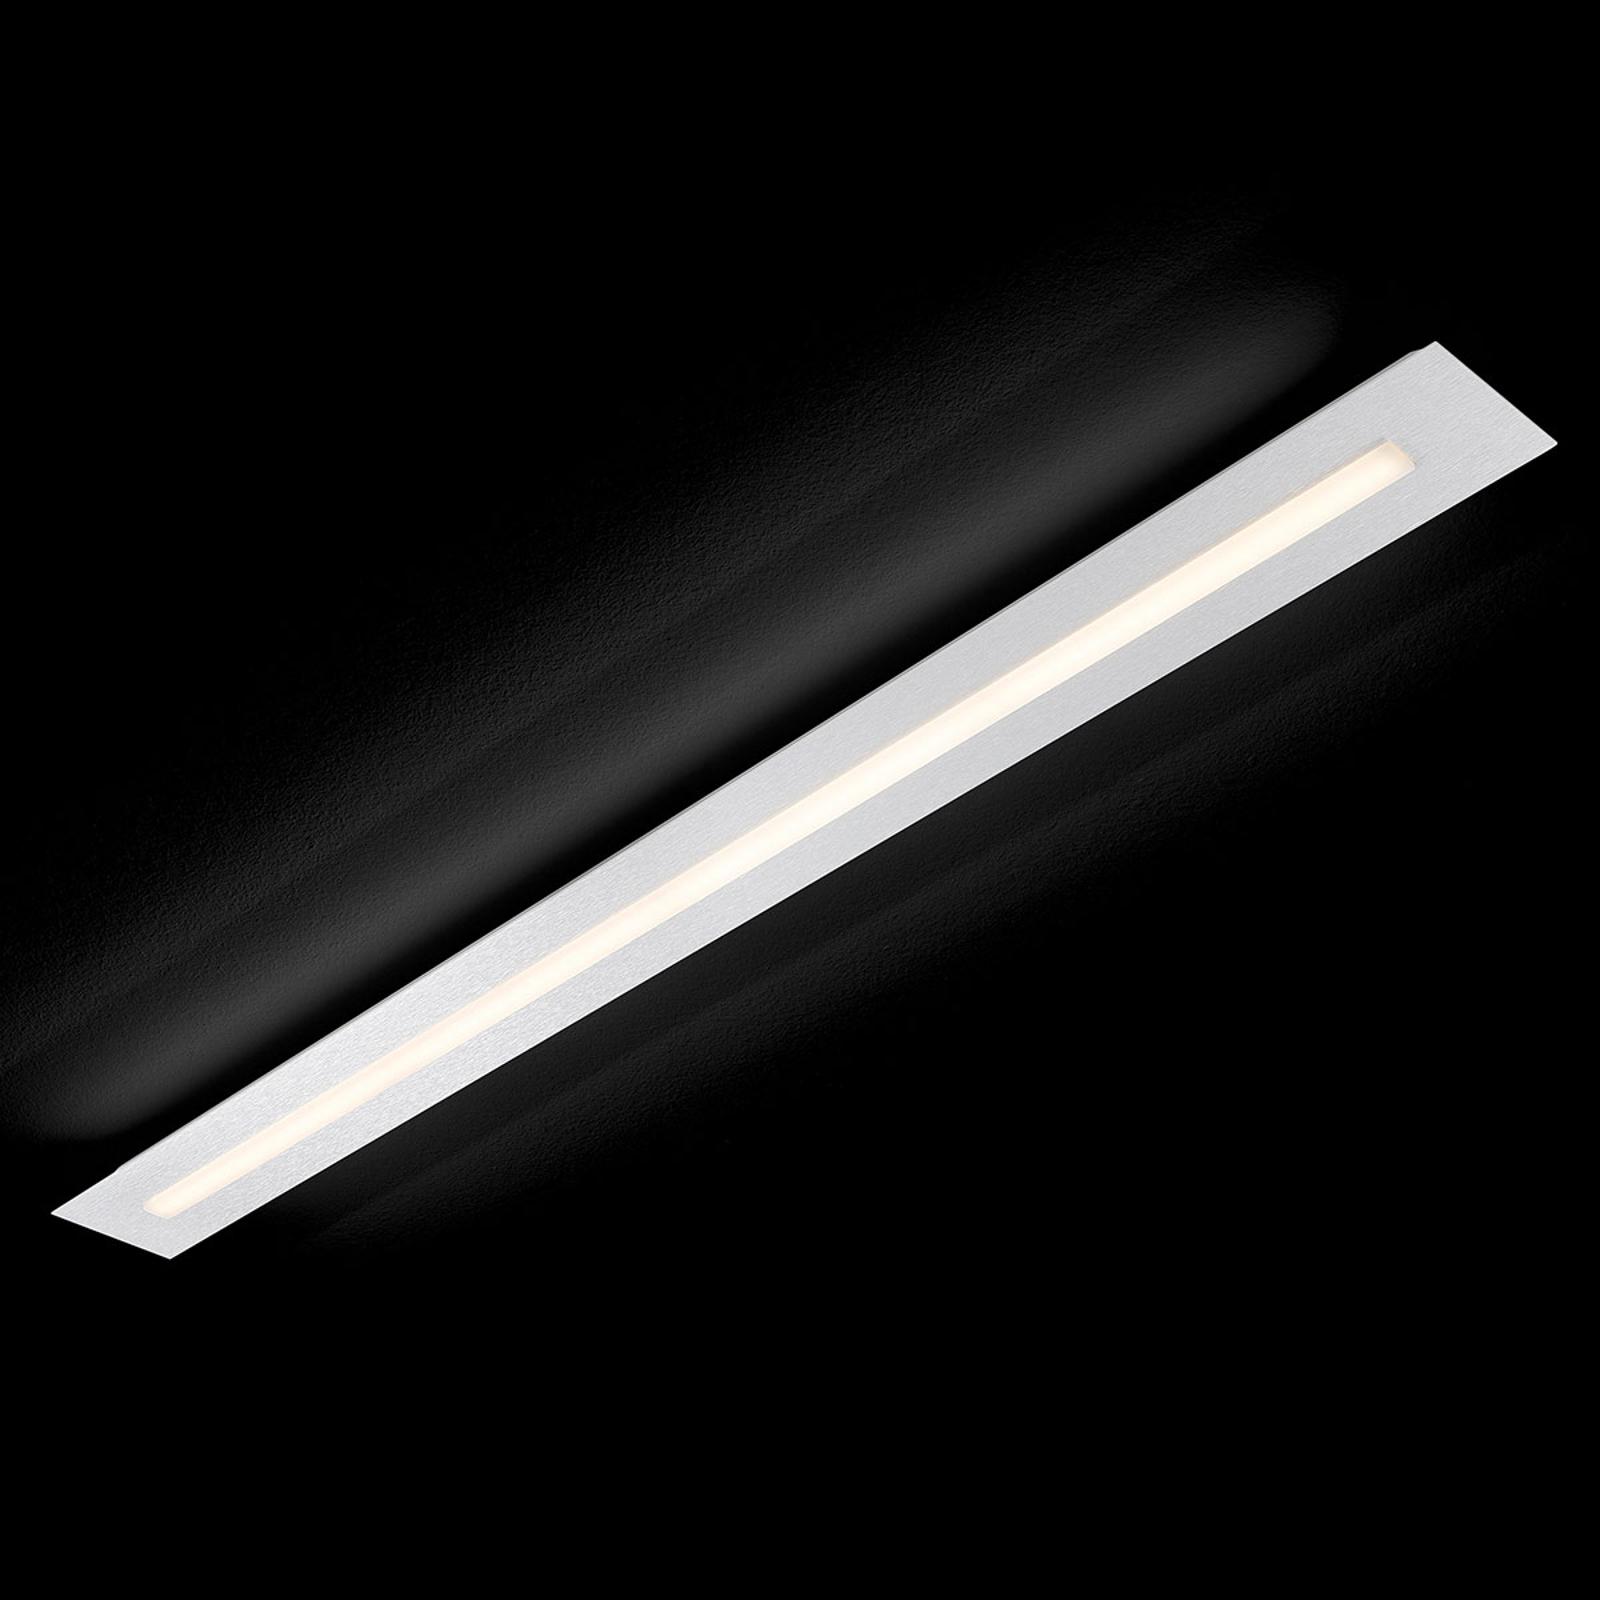 GROSSMANN Fis LED-Deckenleuchte, 104 cm